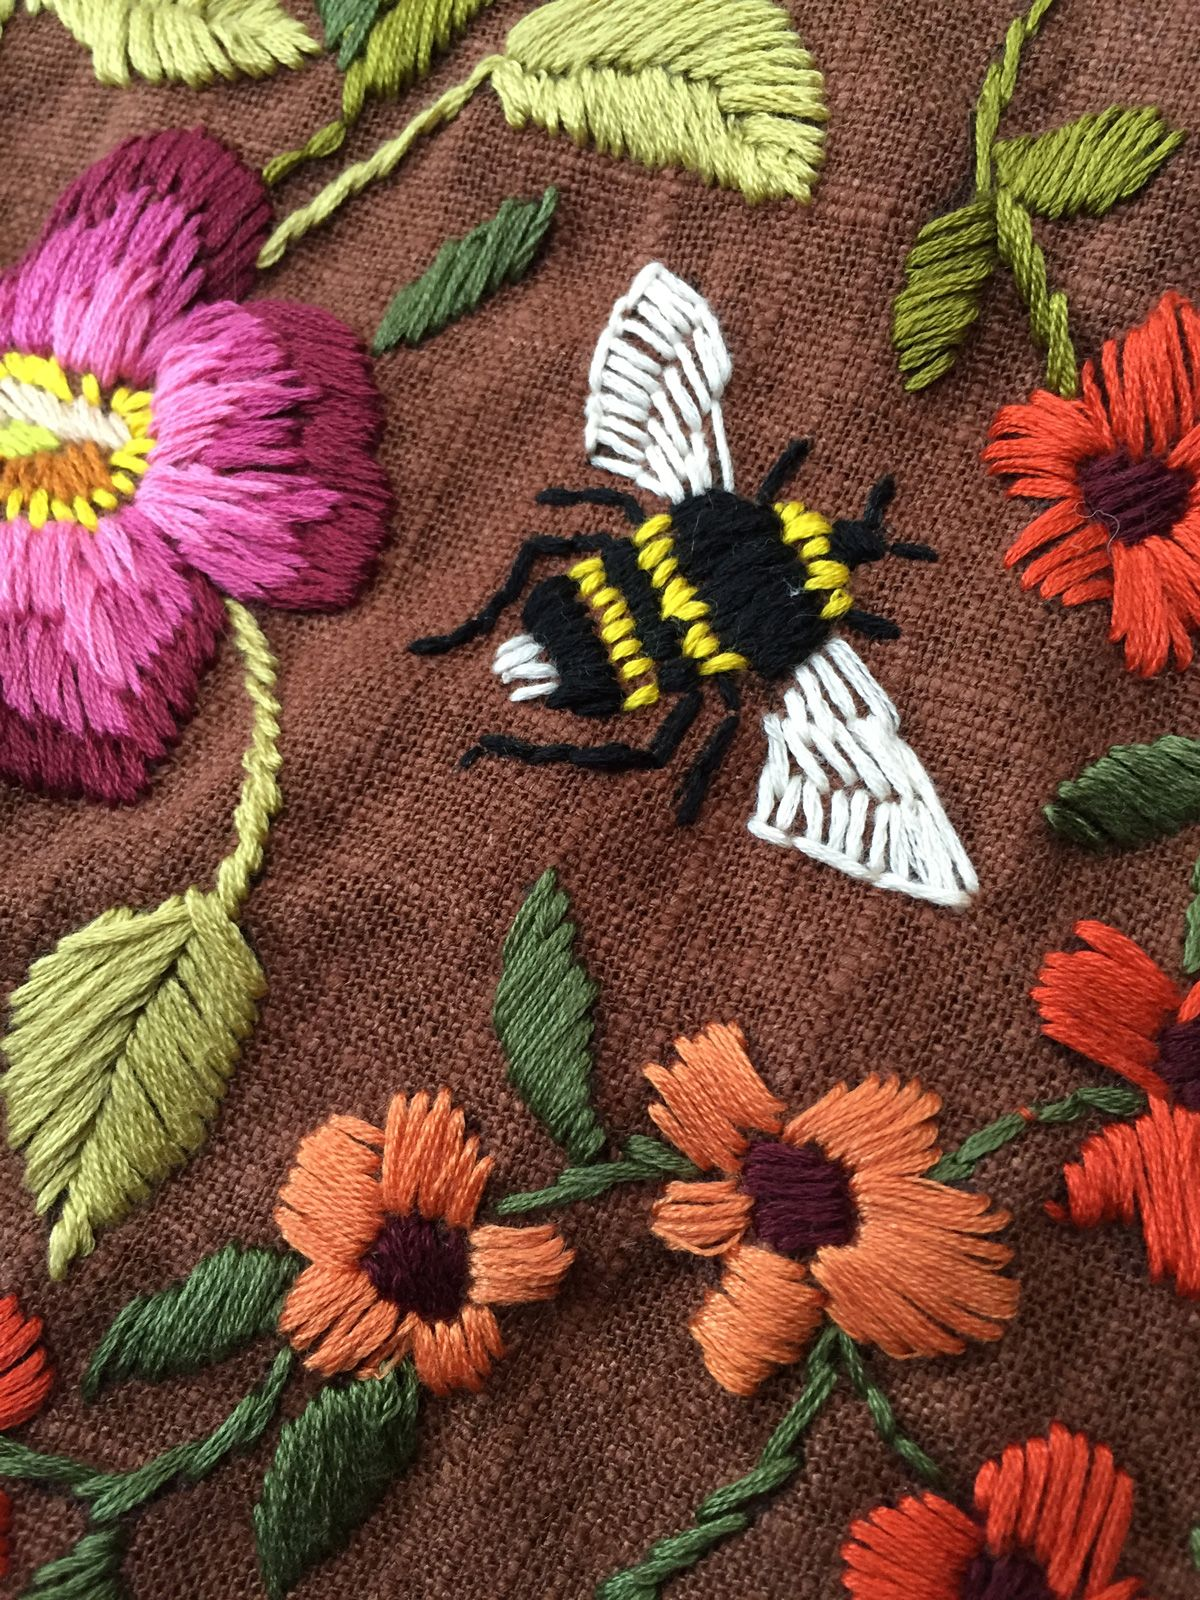 Burda Style  Magazin  Burda Style 022017  Atelierbesuch Tessa Perlow ·  Embroidery Arthow